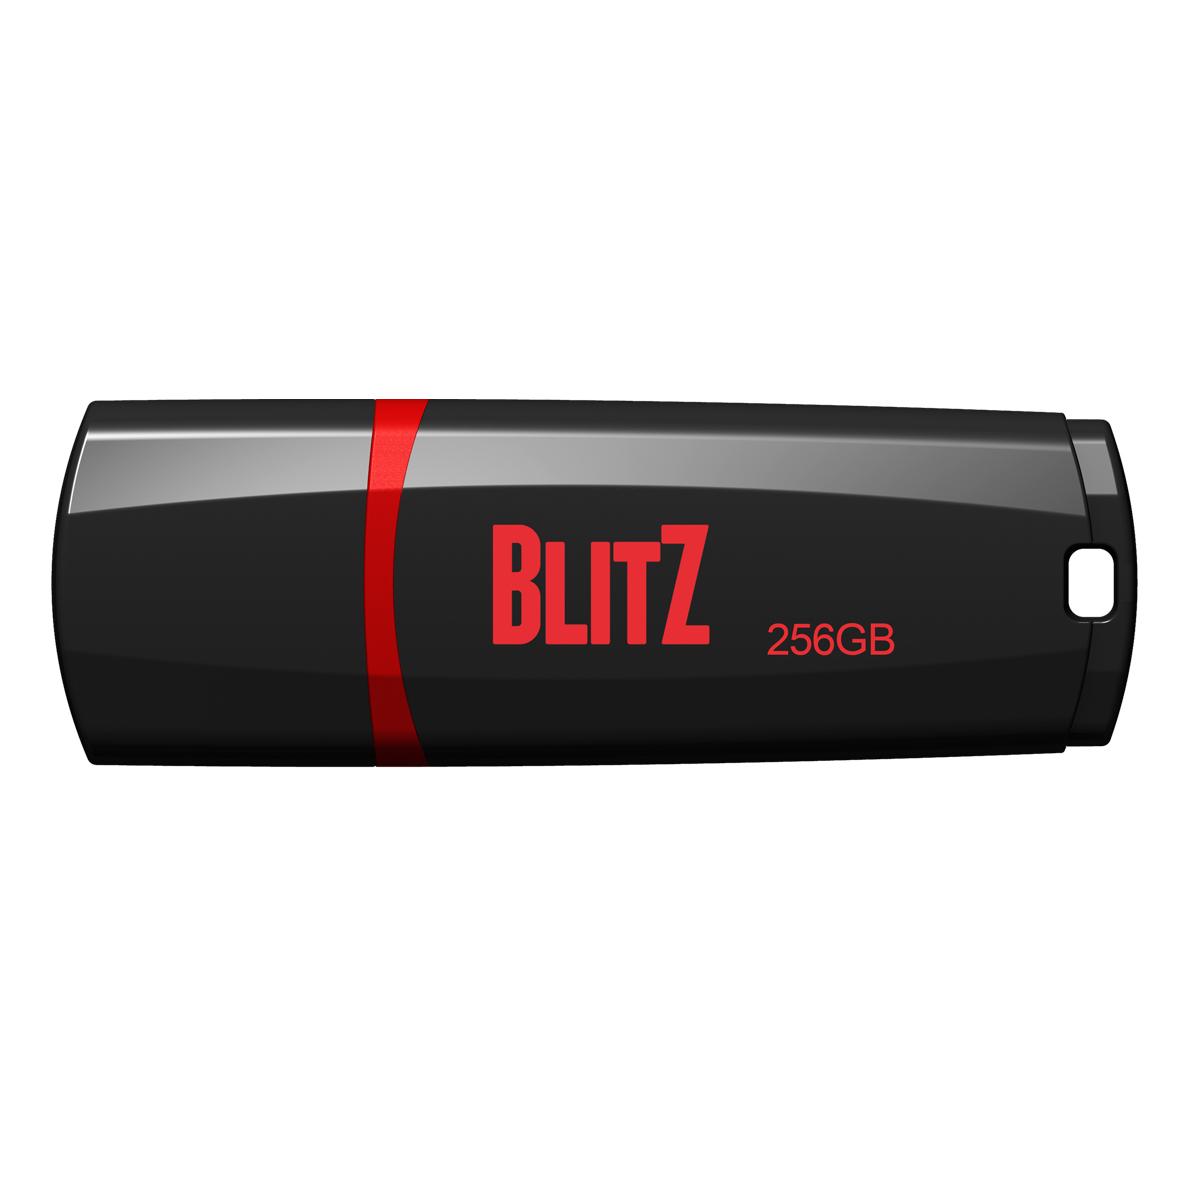 256GB Patriot Blitz USB 3.0, černý LED